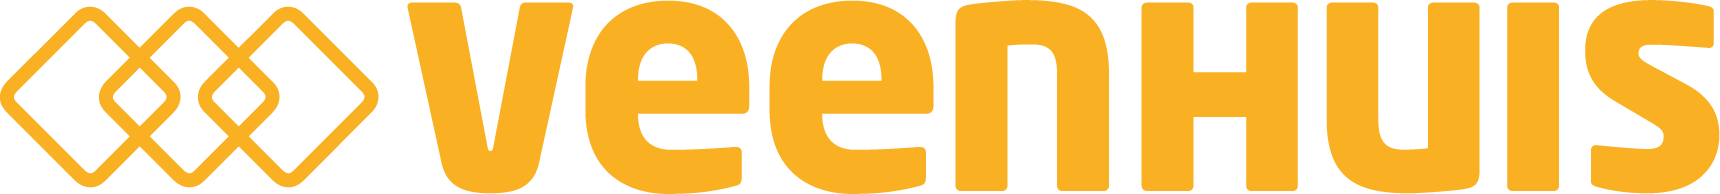 Schuitemaker Machines B.V. logo